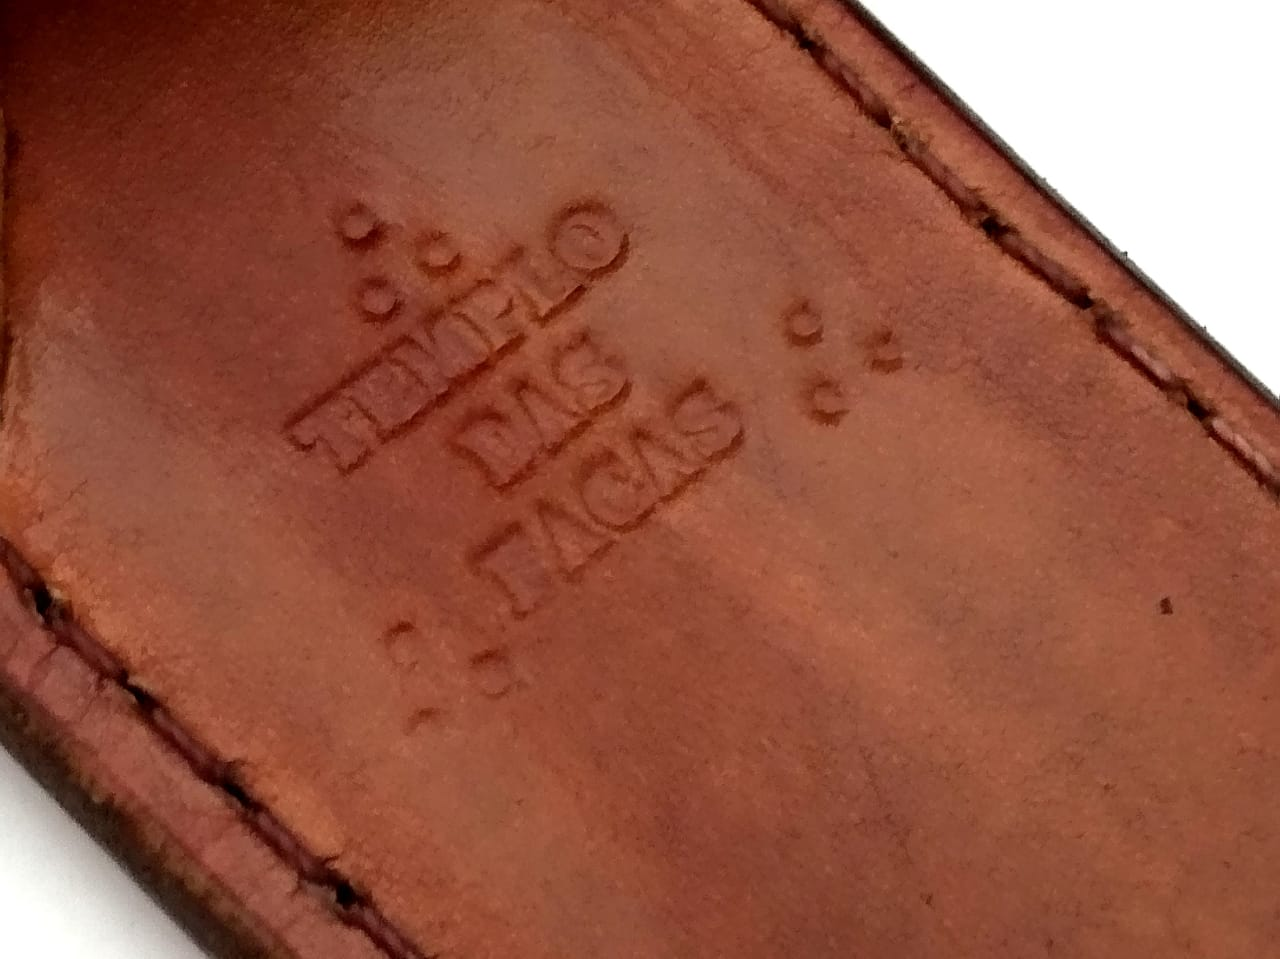 Faca artesanal gaúcha campeira integral aço inox 08 polegadas